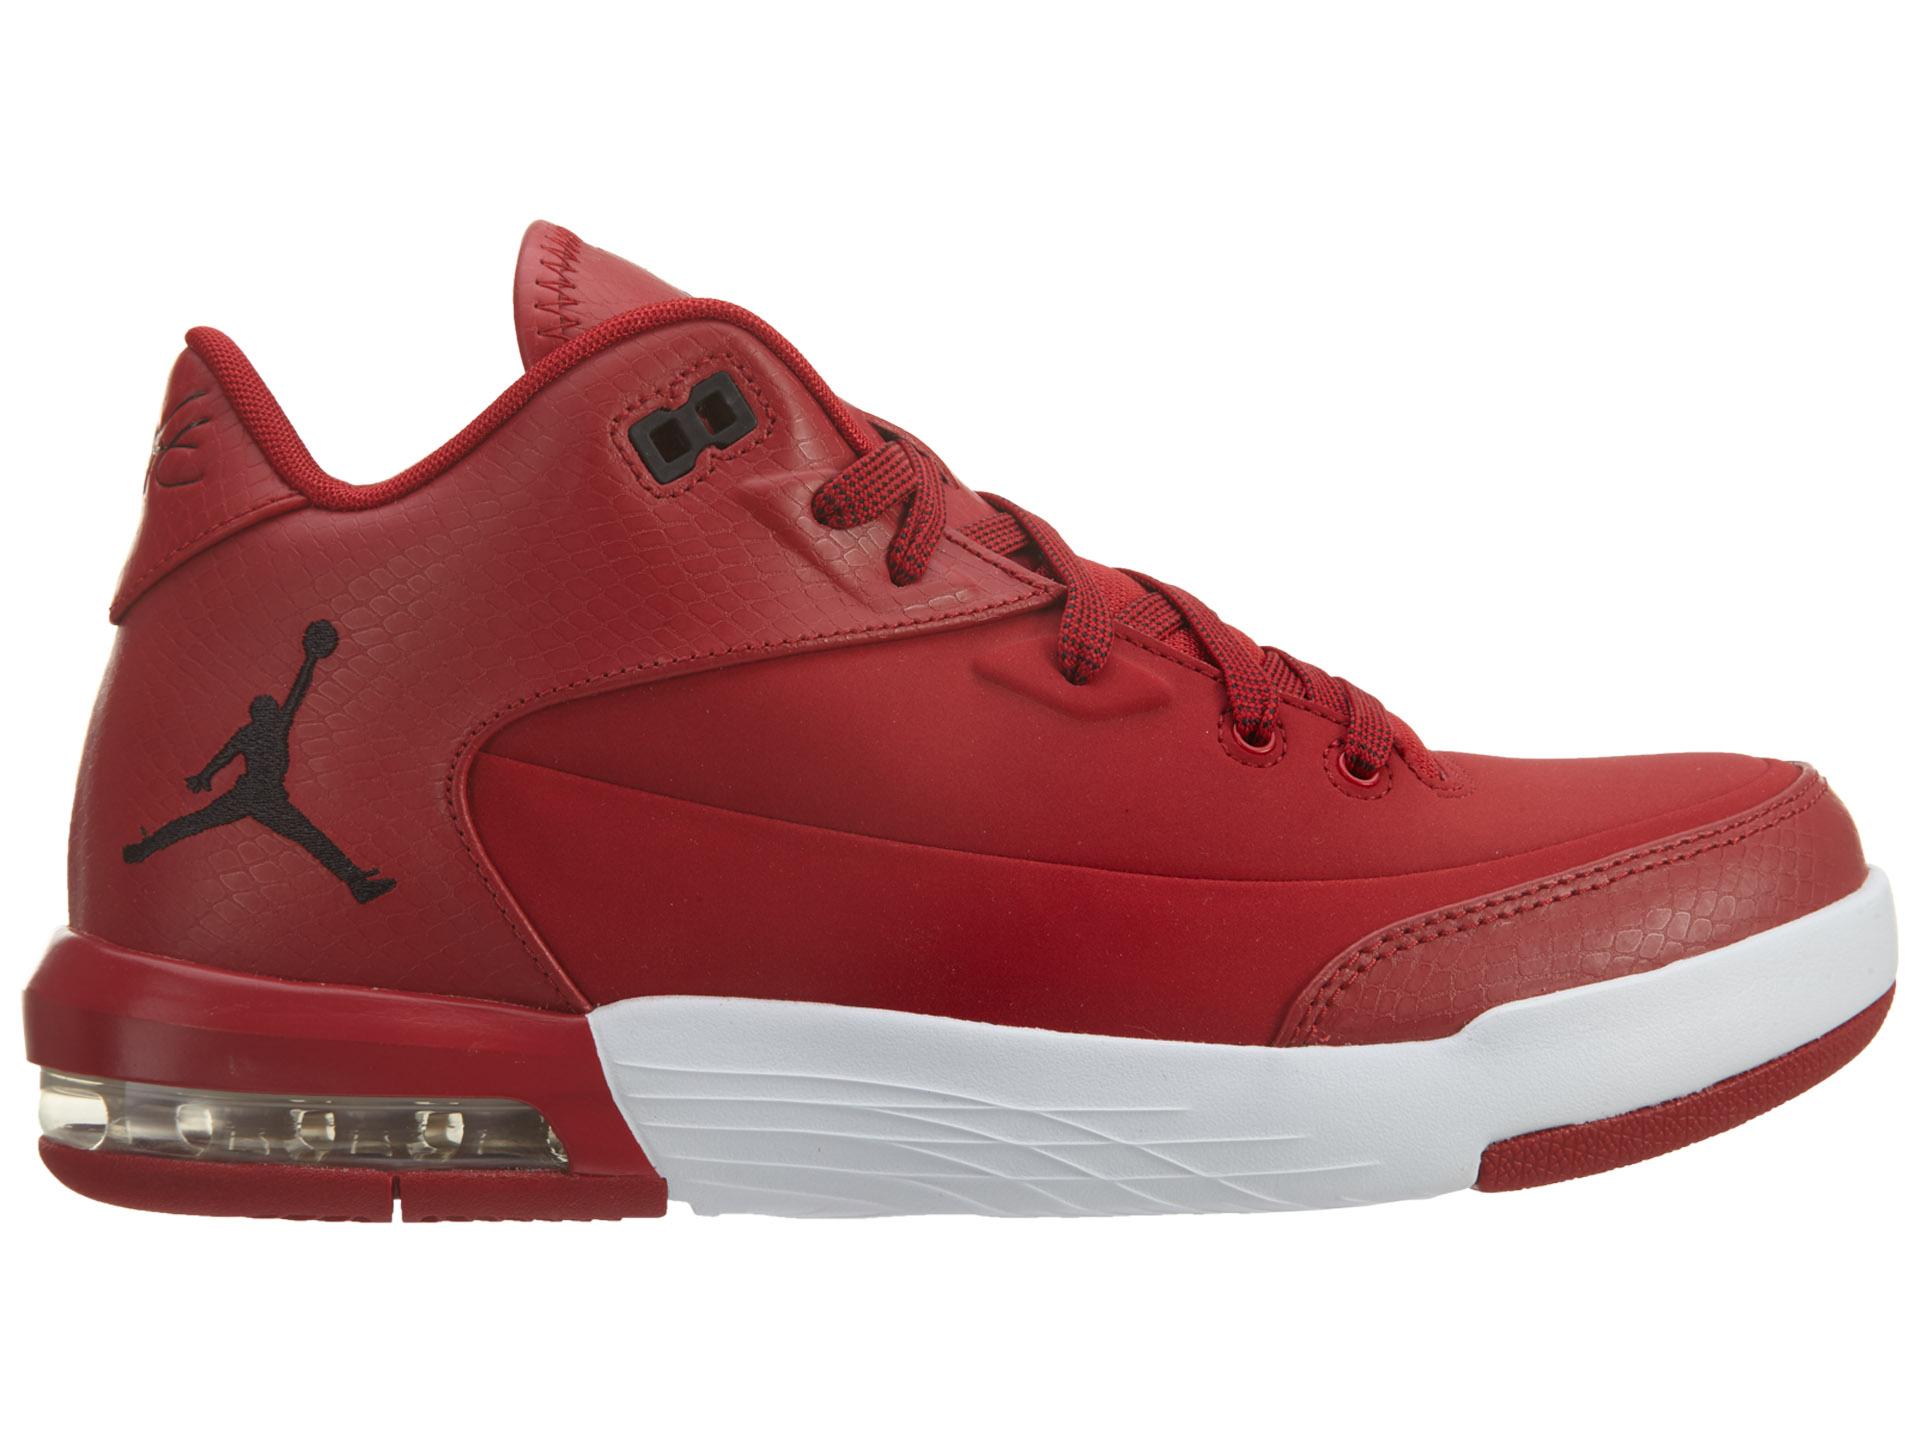 Jordan Flight Origin 3 Gym Red/Black